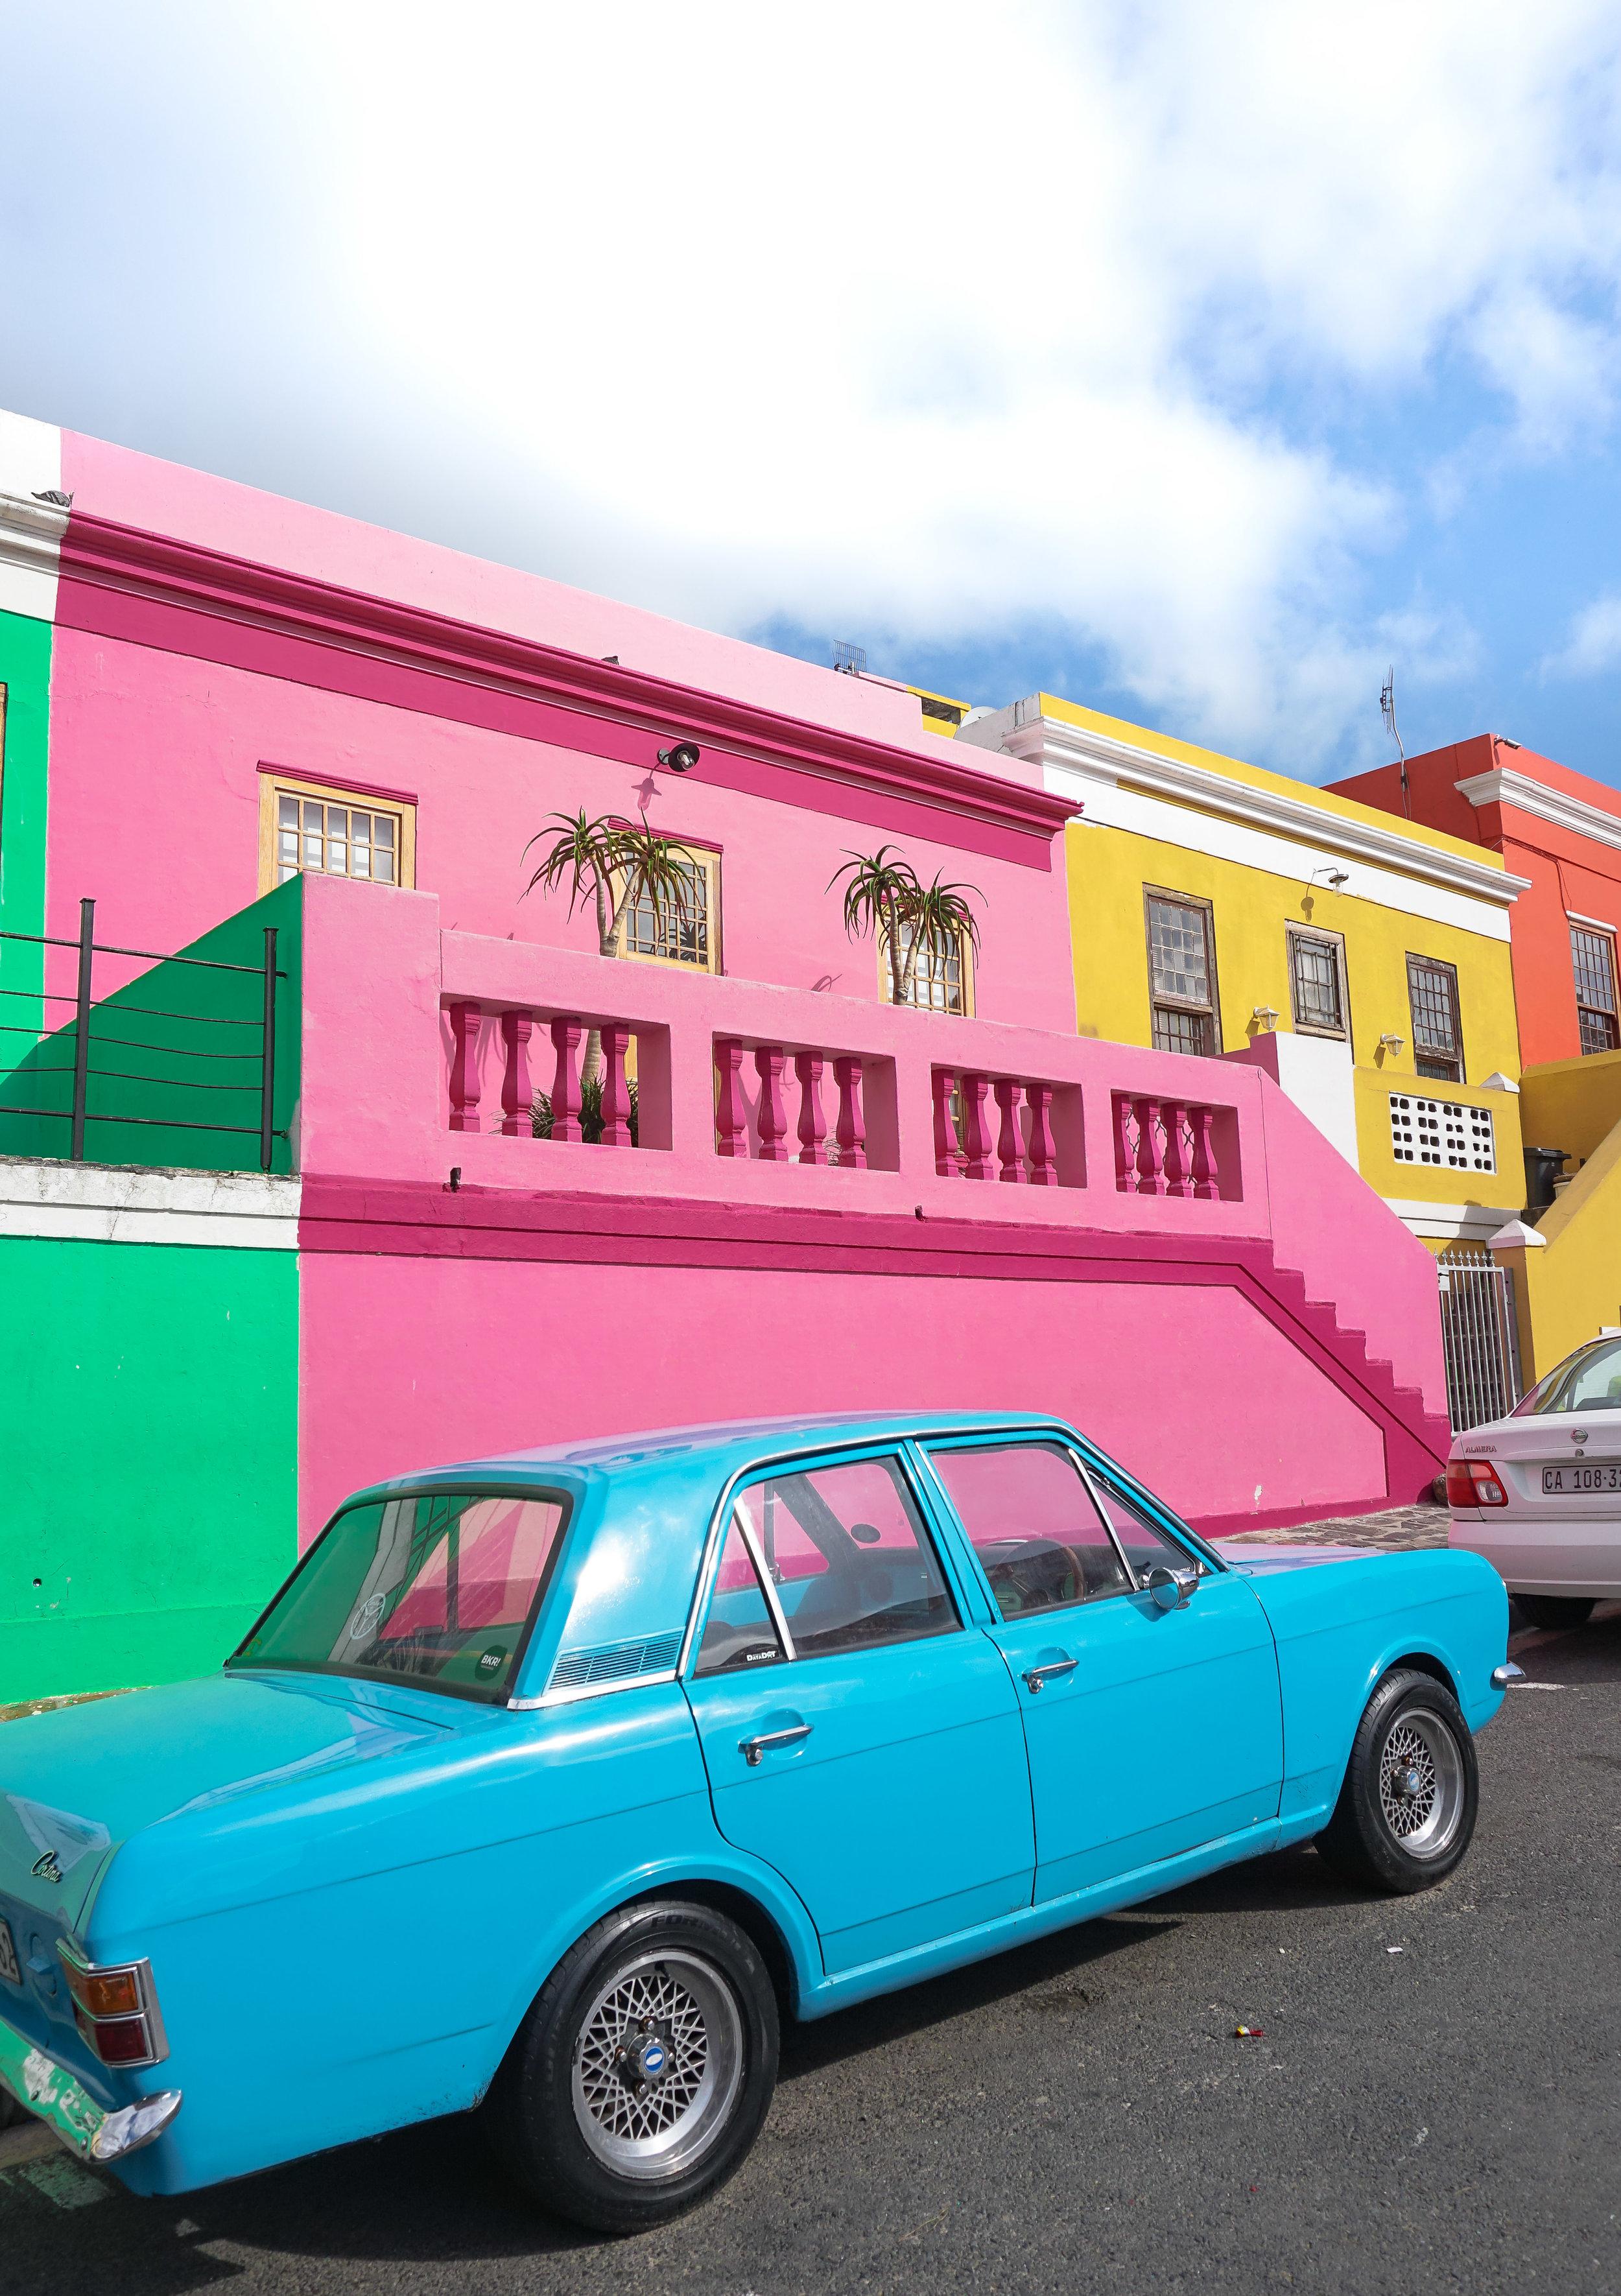 curio.trips.south.africa.bo.kaap.colourful.houses.blue.car.portrait.jpg